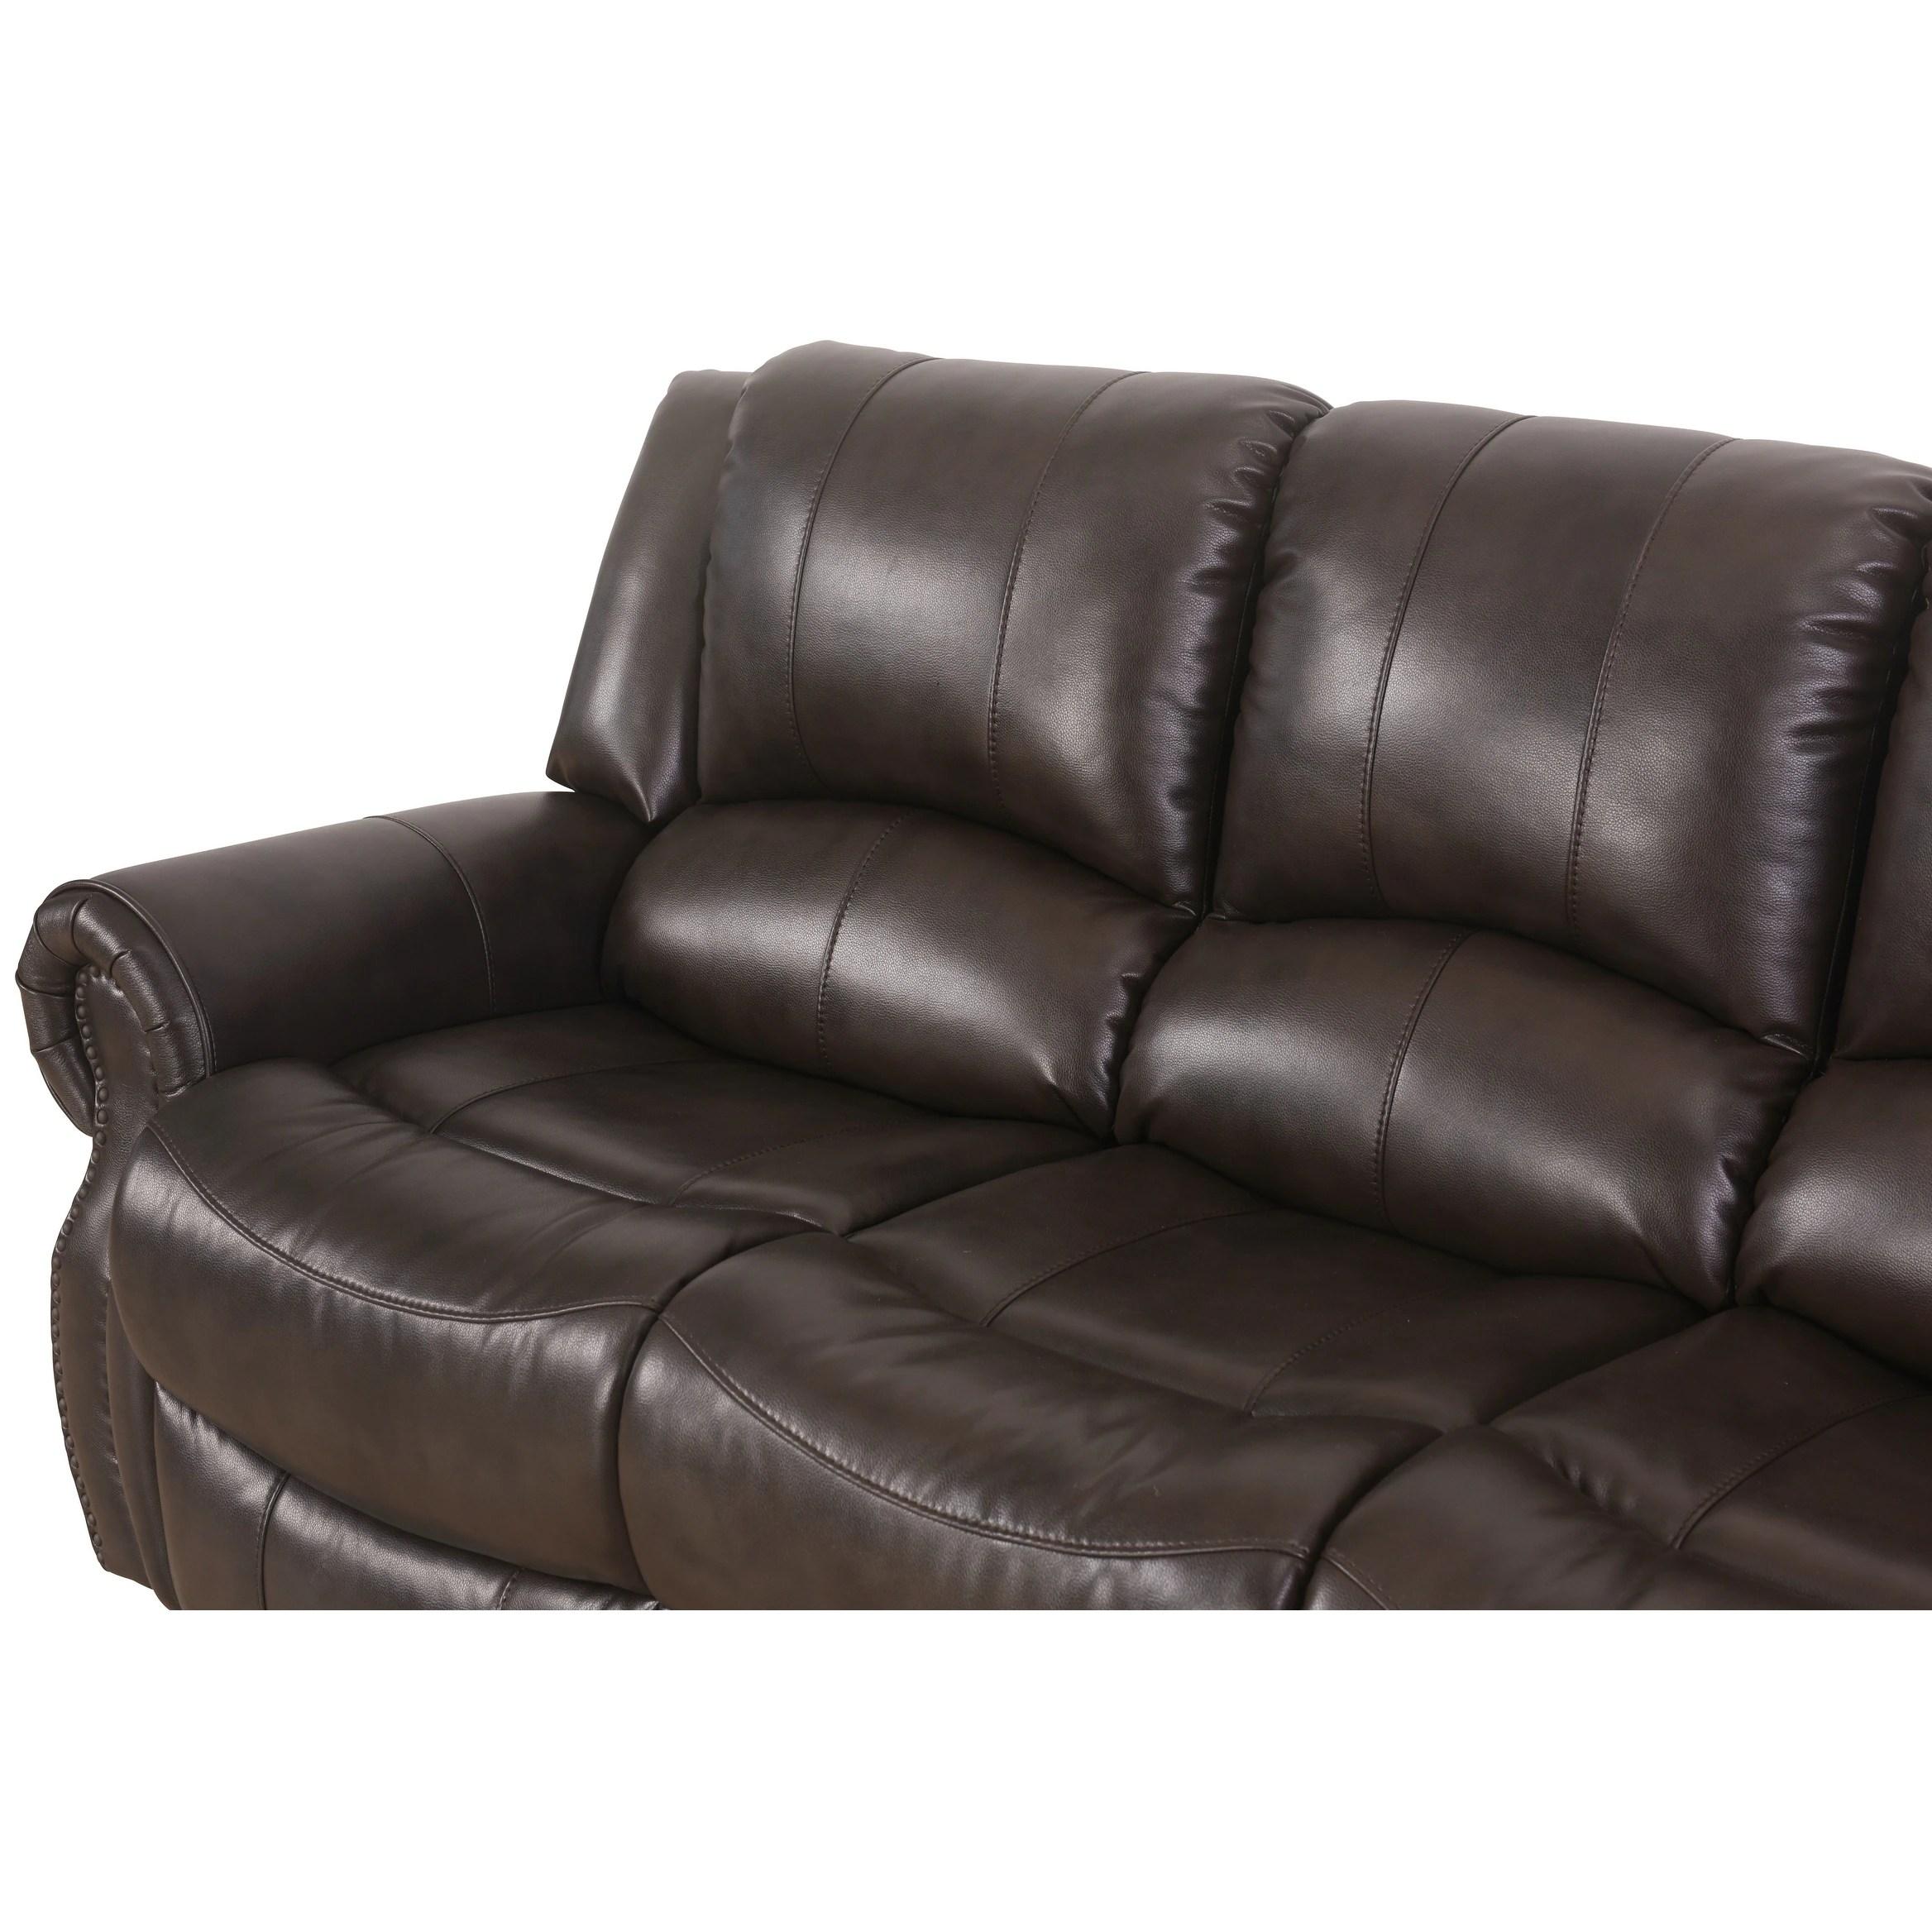 abbyson living bradford faux leather reclining sofa dark brown pier 1 table baci